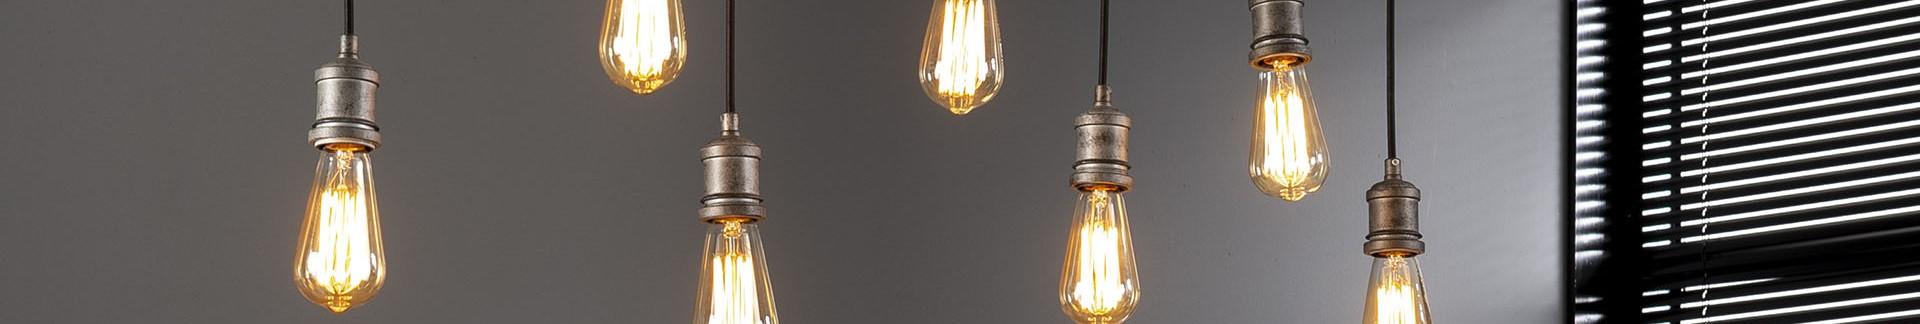 industriellen lampen